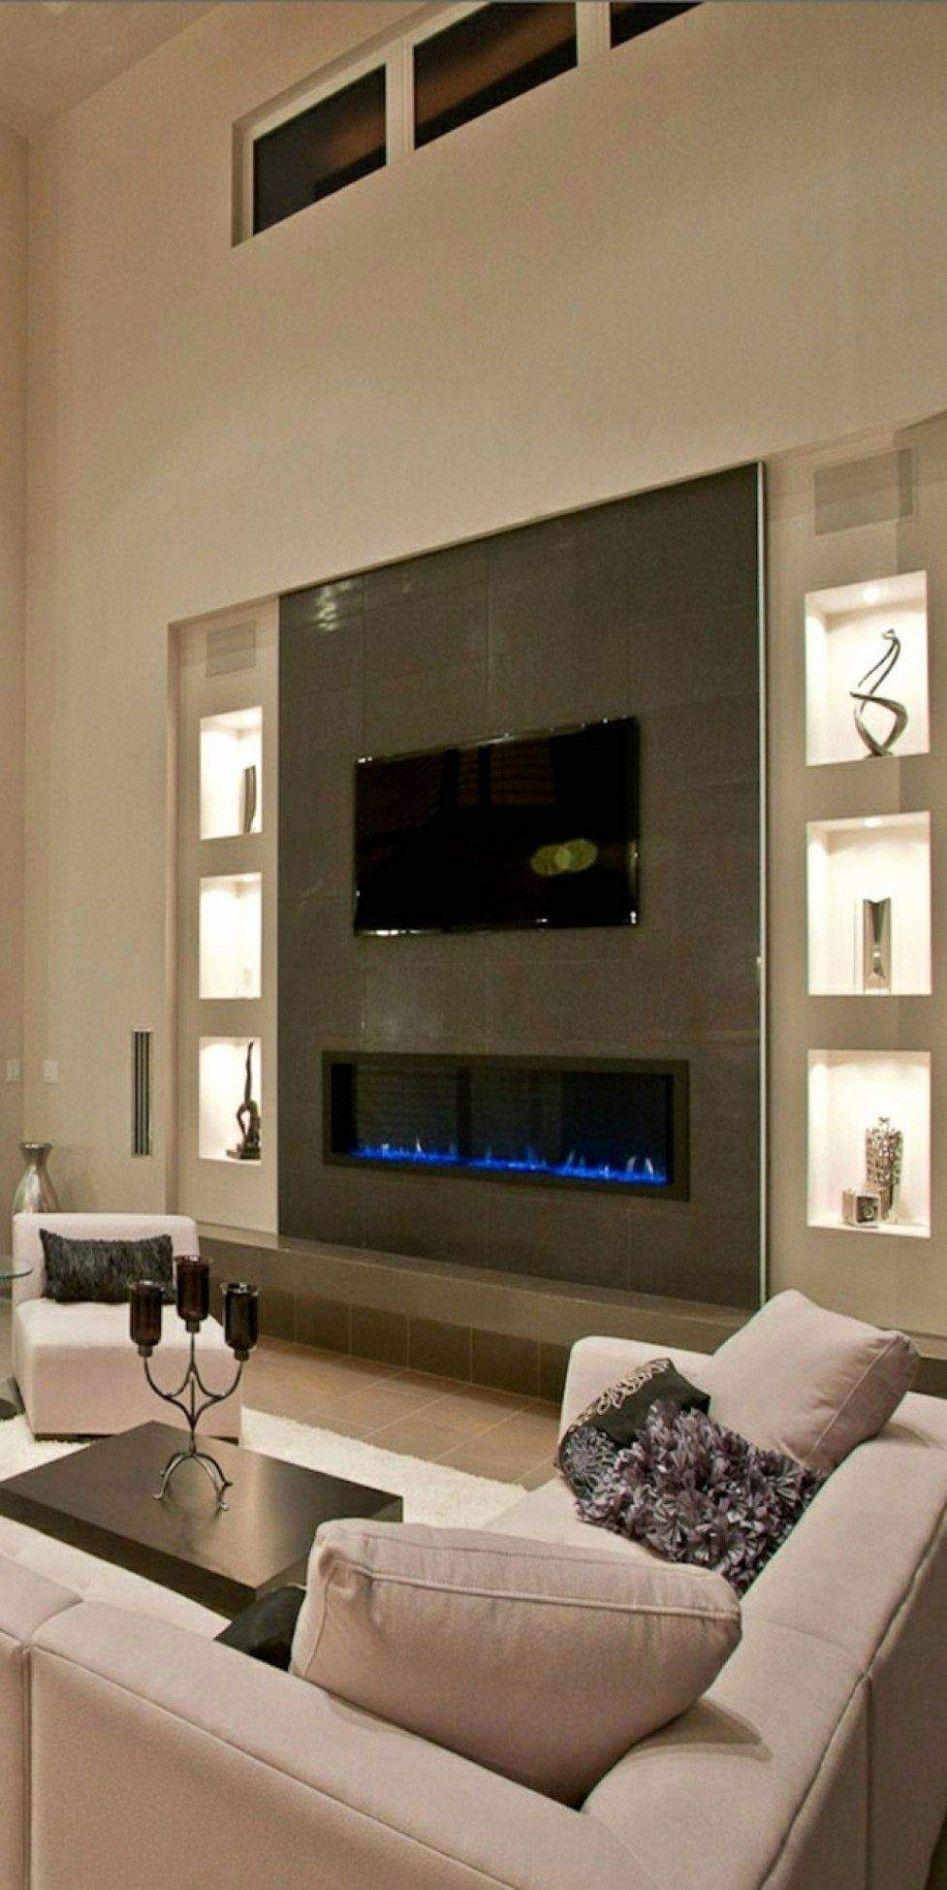 10 Pelletofen Wohnzimmer Trendy Fireplace Tv Wall Tv Wall Decor Fireplace Feature Wall